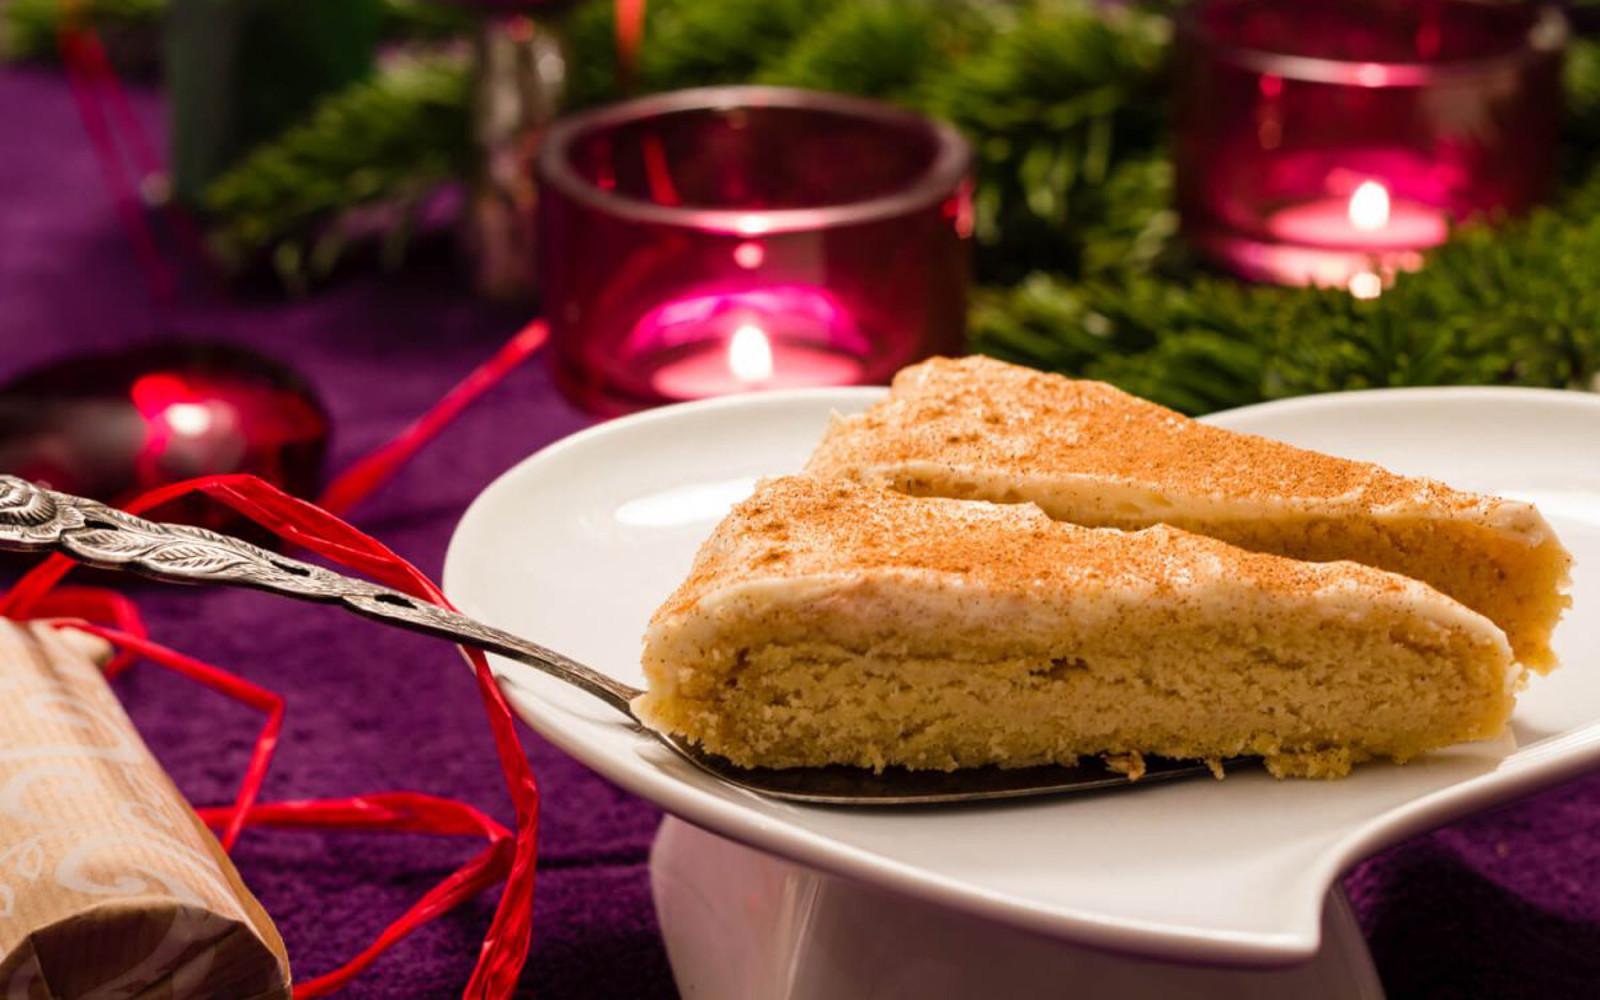 Vegan Gluten-Free Speculaas Cheesecake